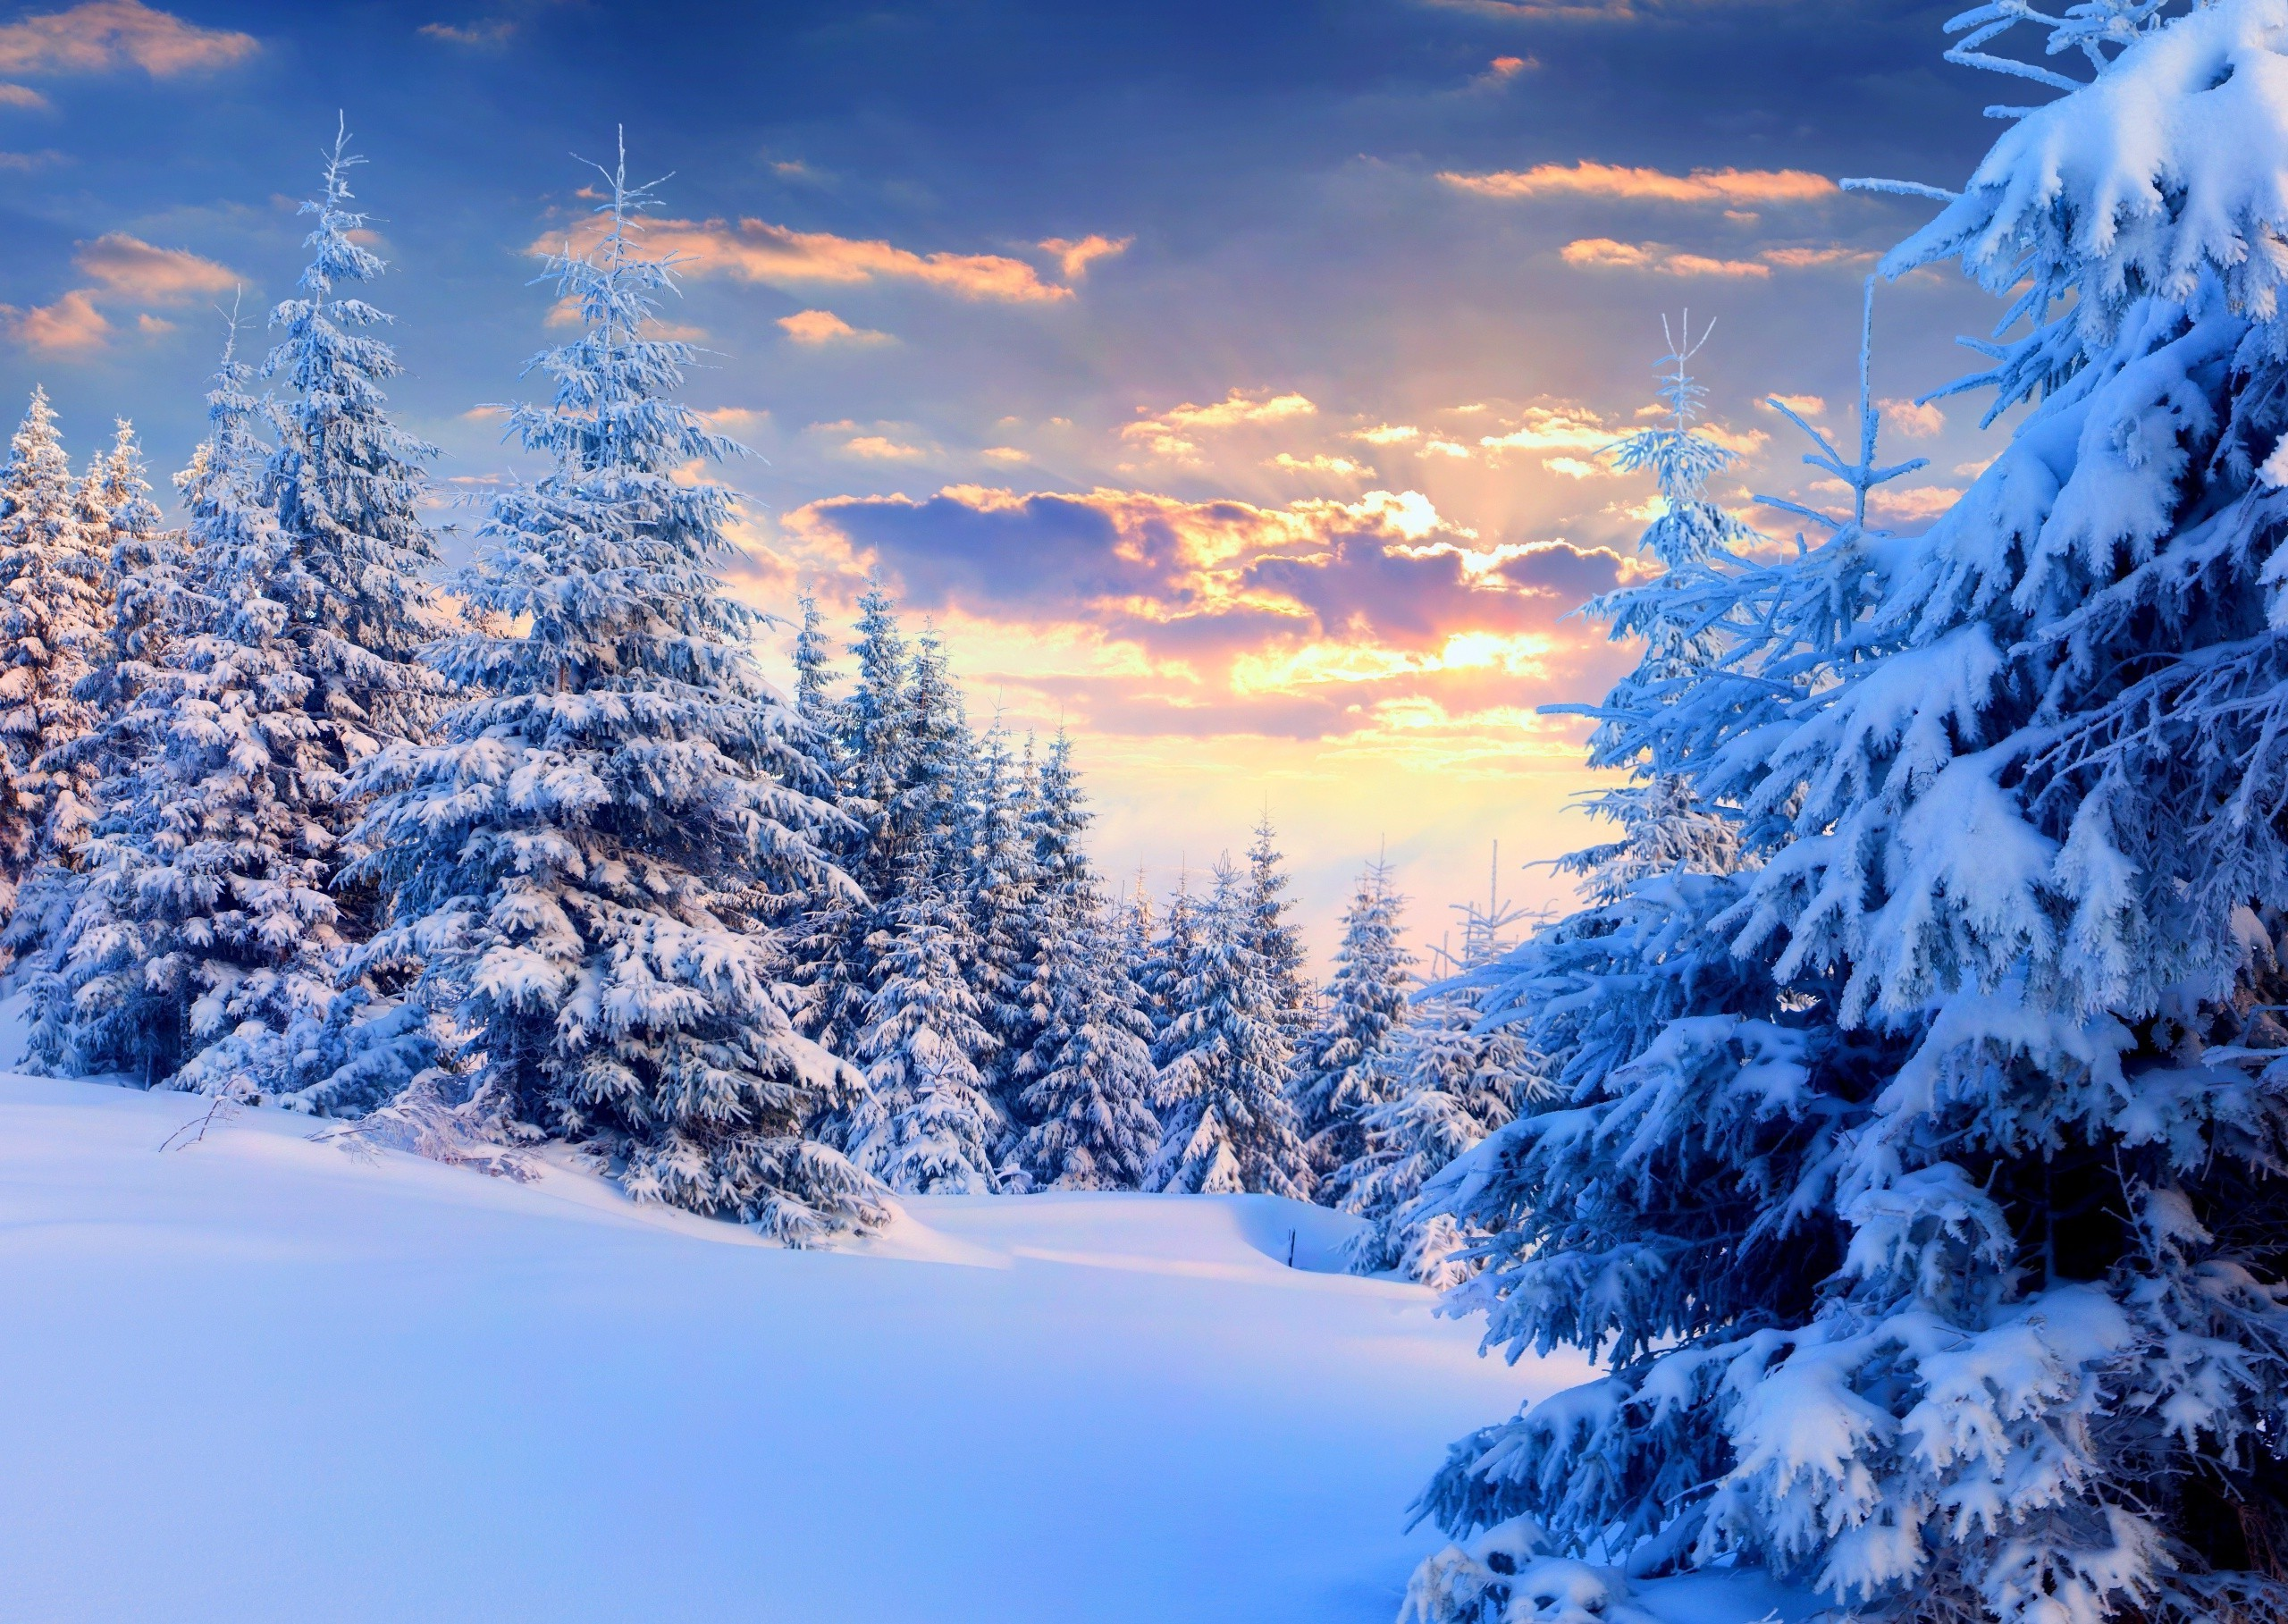 Wallpaper snow sunset winter trees forest tracks desktop